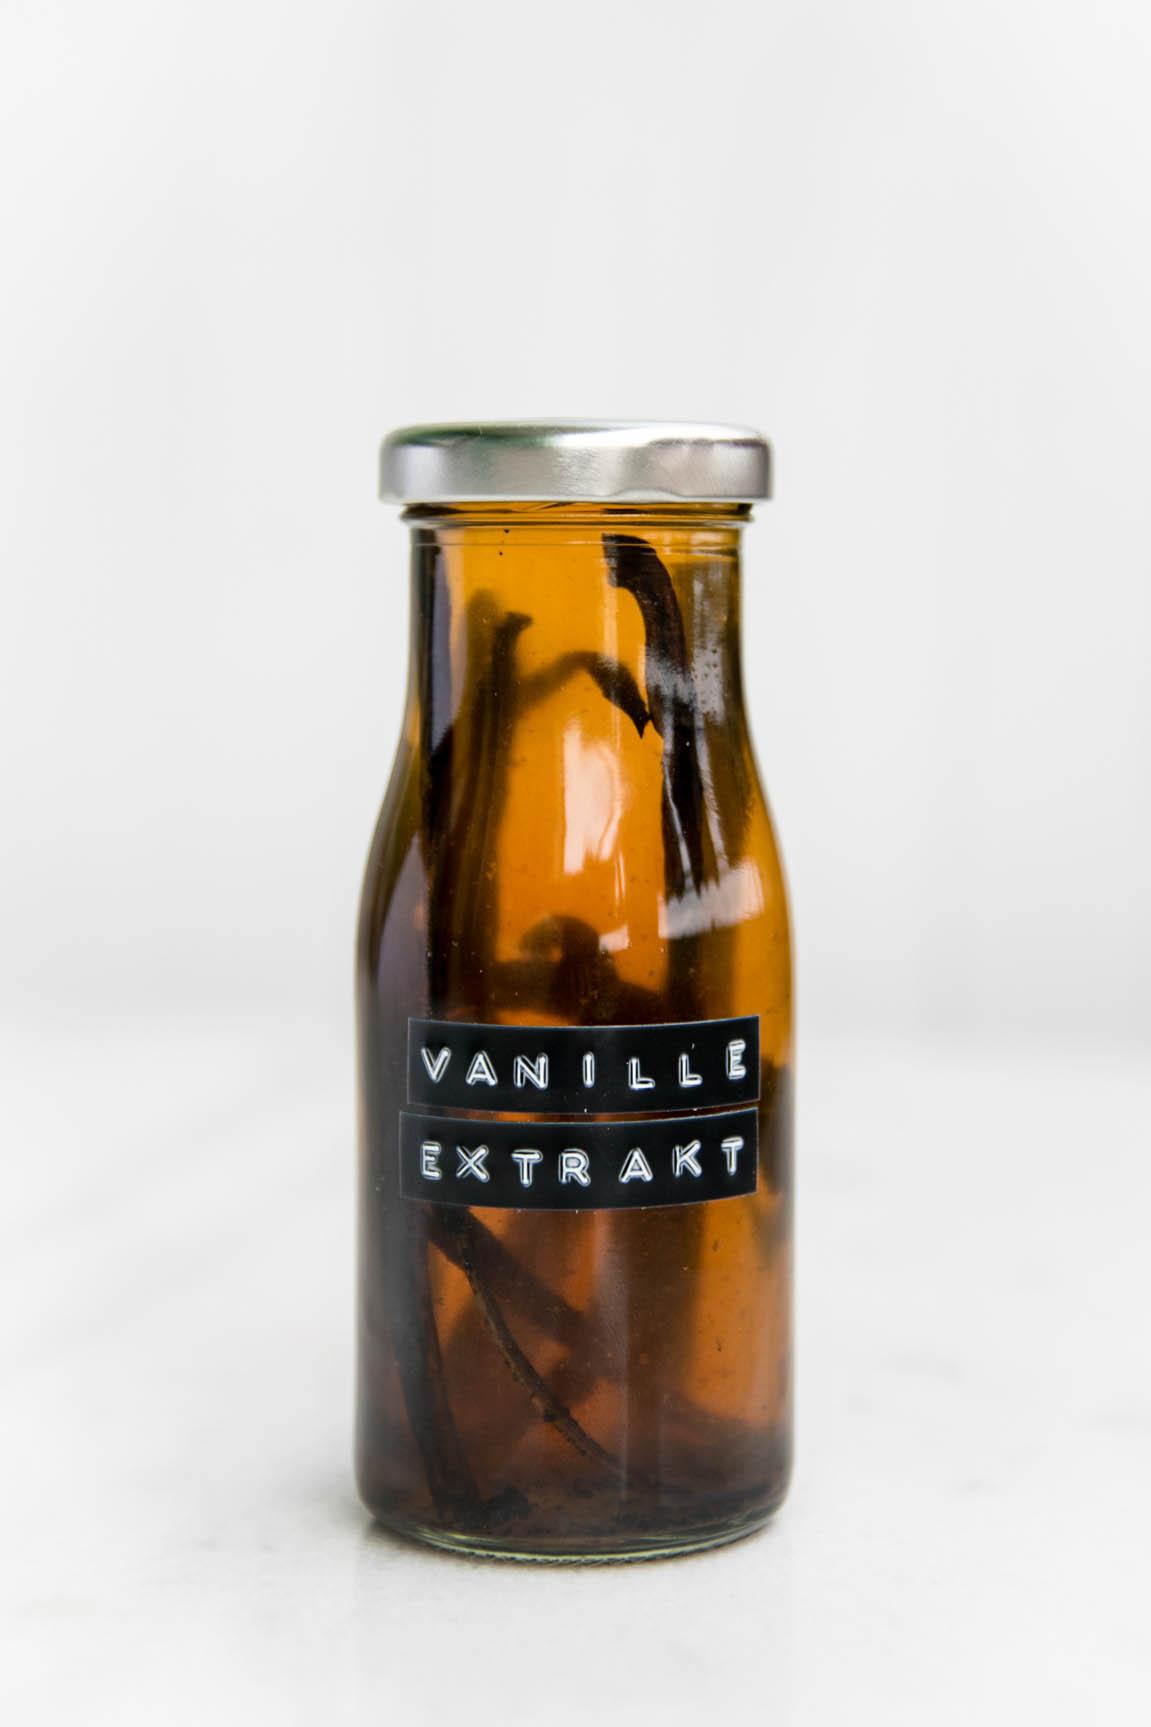 vanille extrakt diy selbermachen rezept foodblog berlin. Black Bedroom Furniture Sets. Home Design Ideas